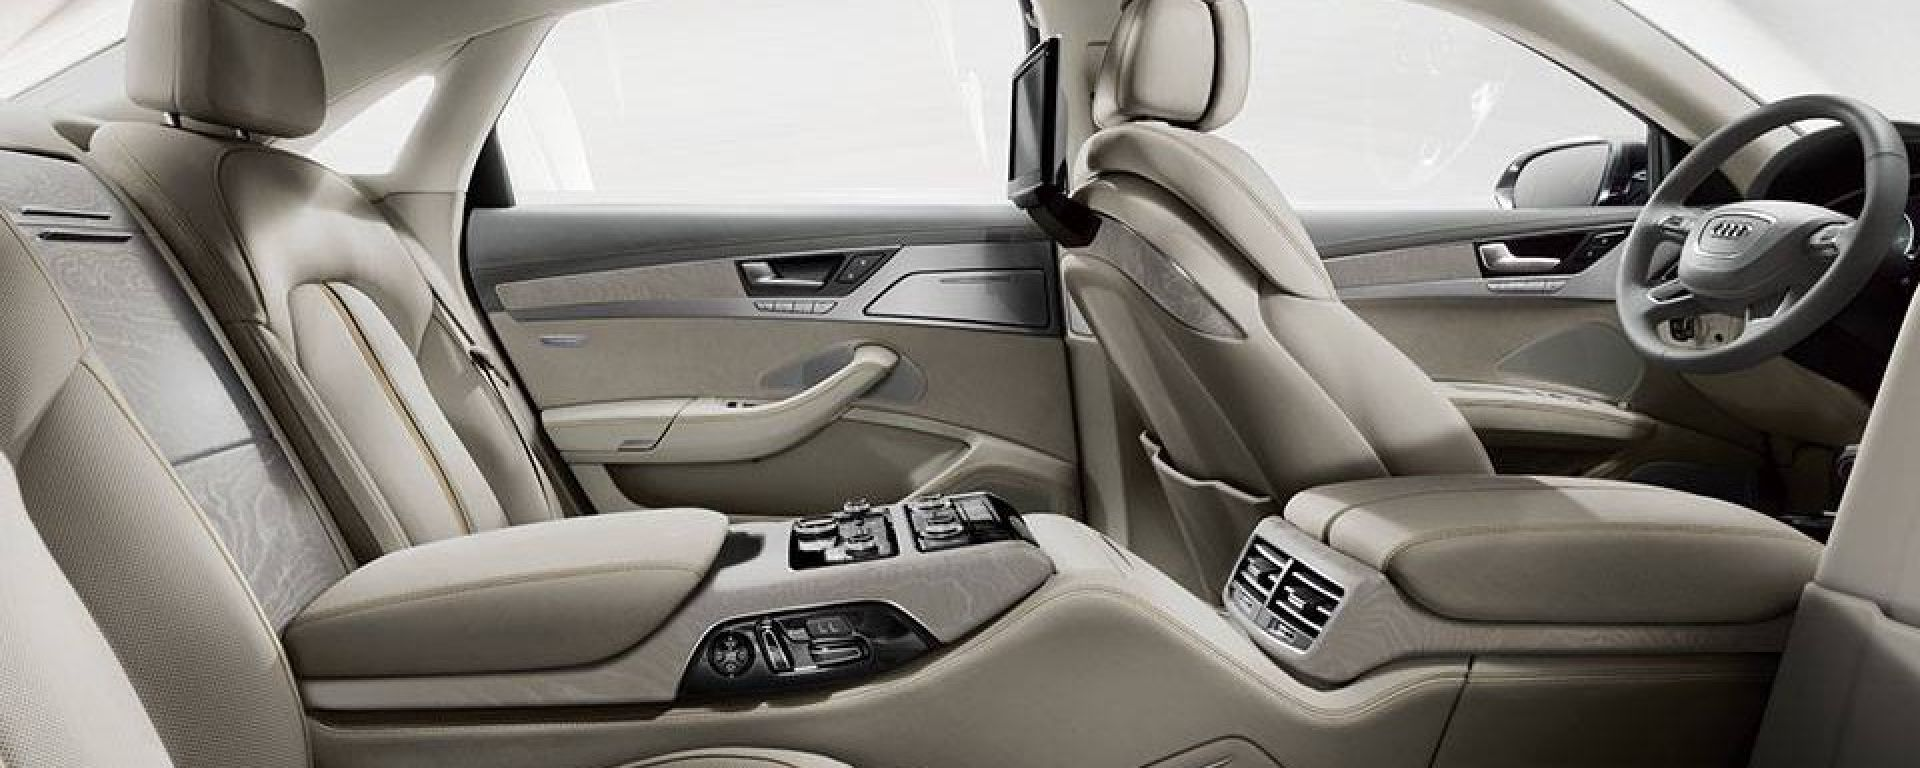 Audi A8 L Chauffeur Edition